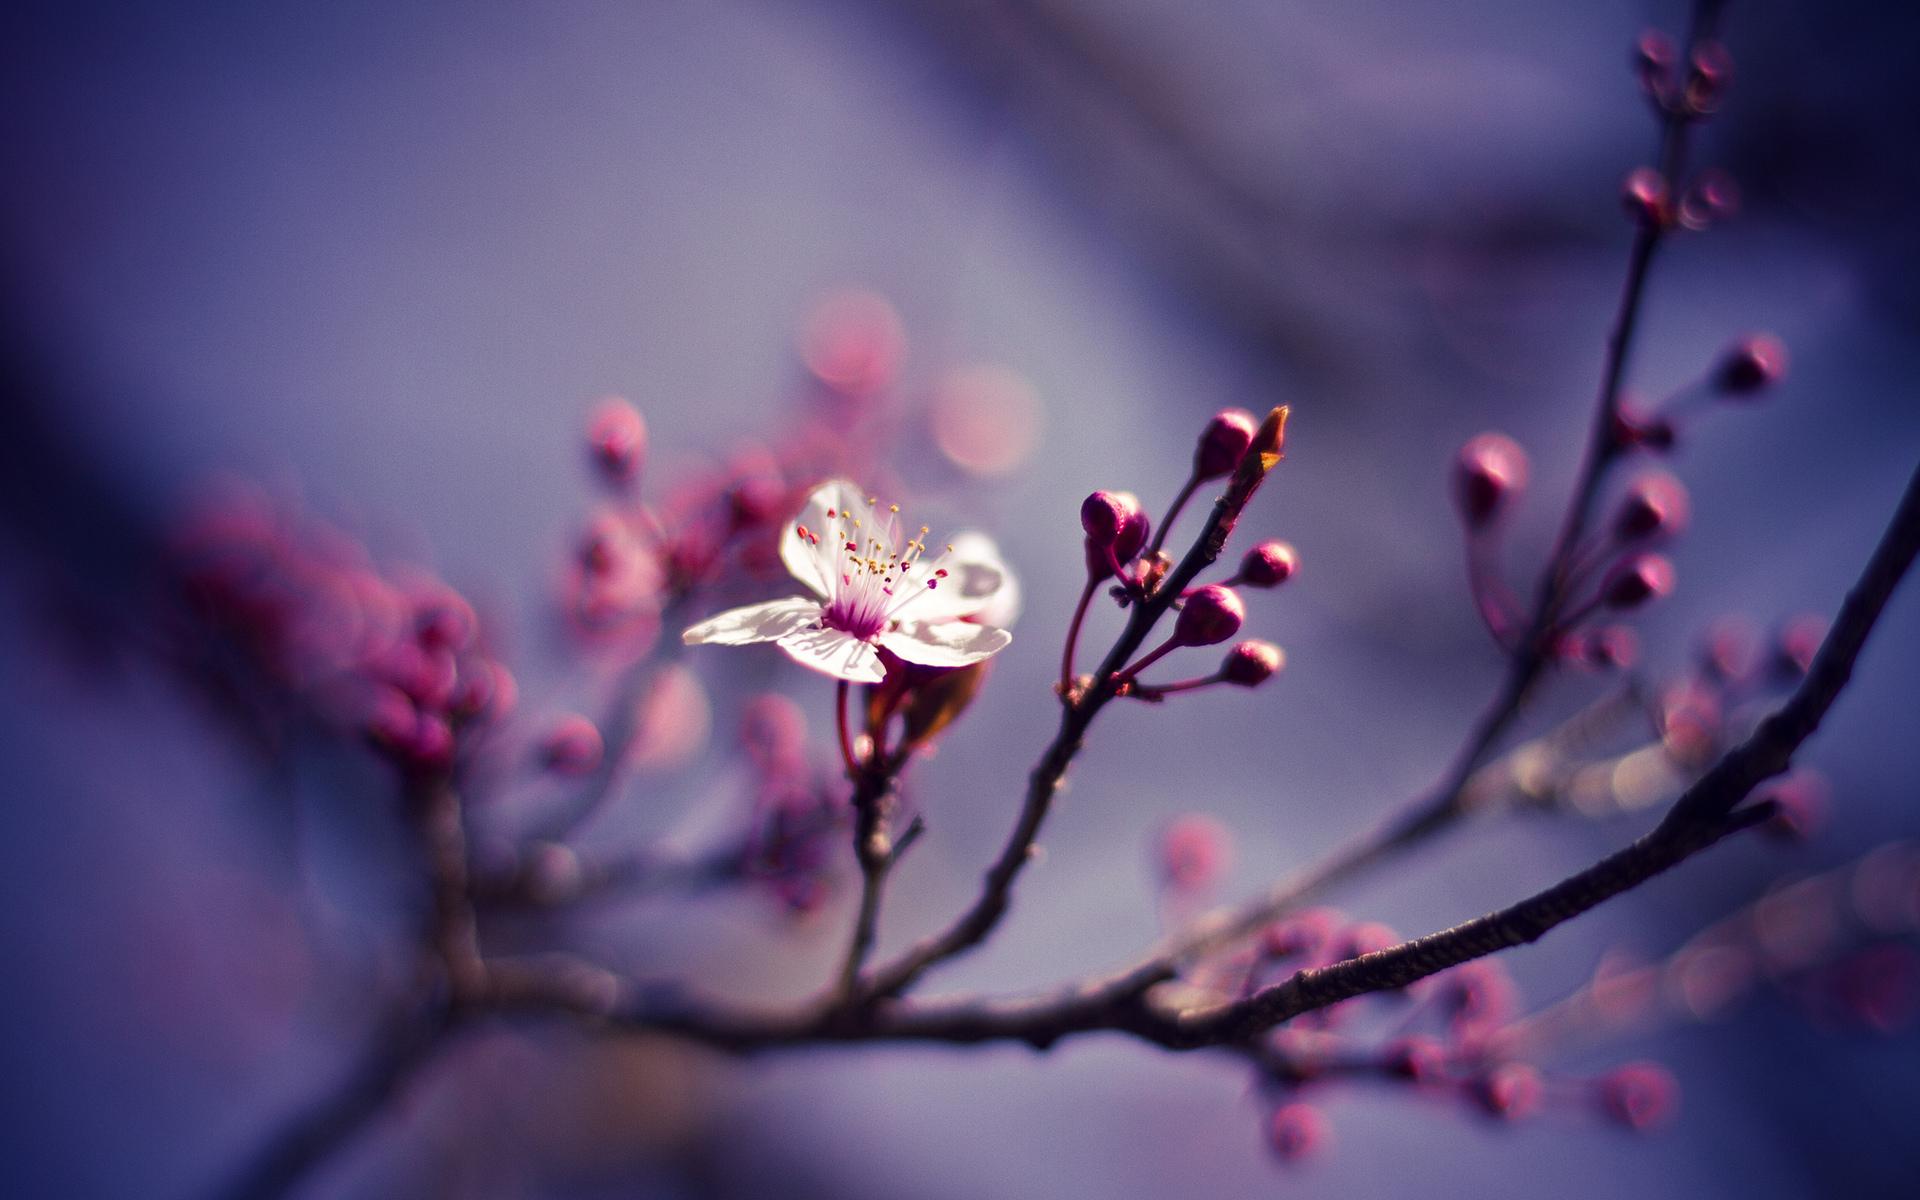 cherry blossom wallpaper cute